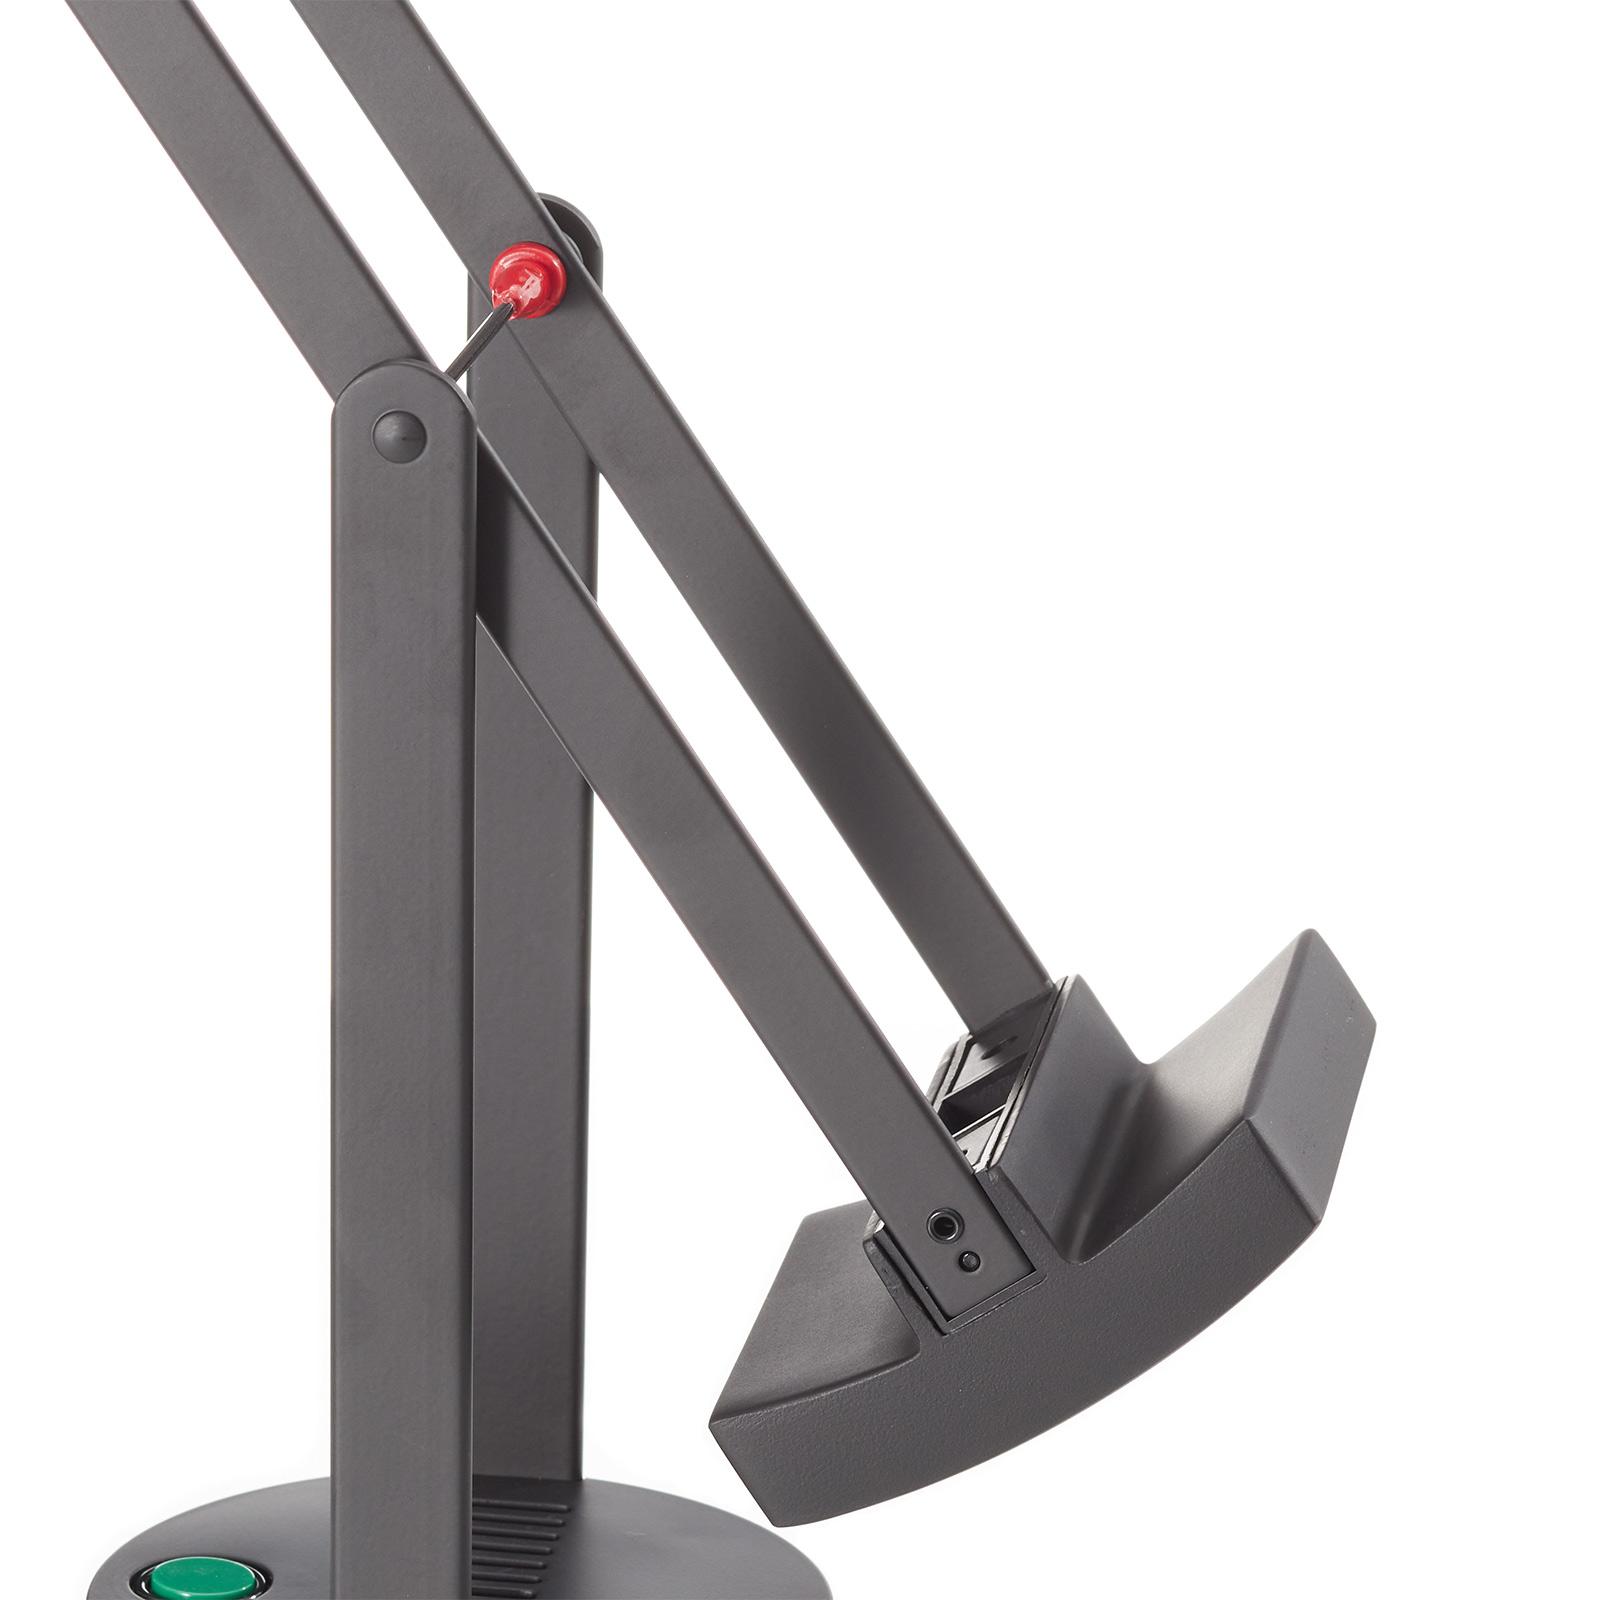 Artemide Tizio LED bordslampa 3 000 K | Lamp24.se